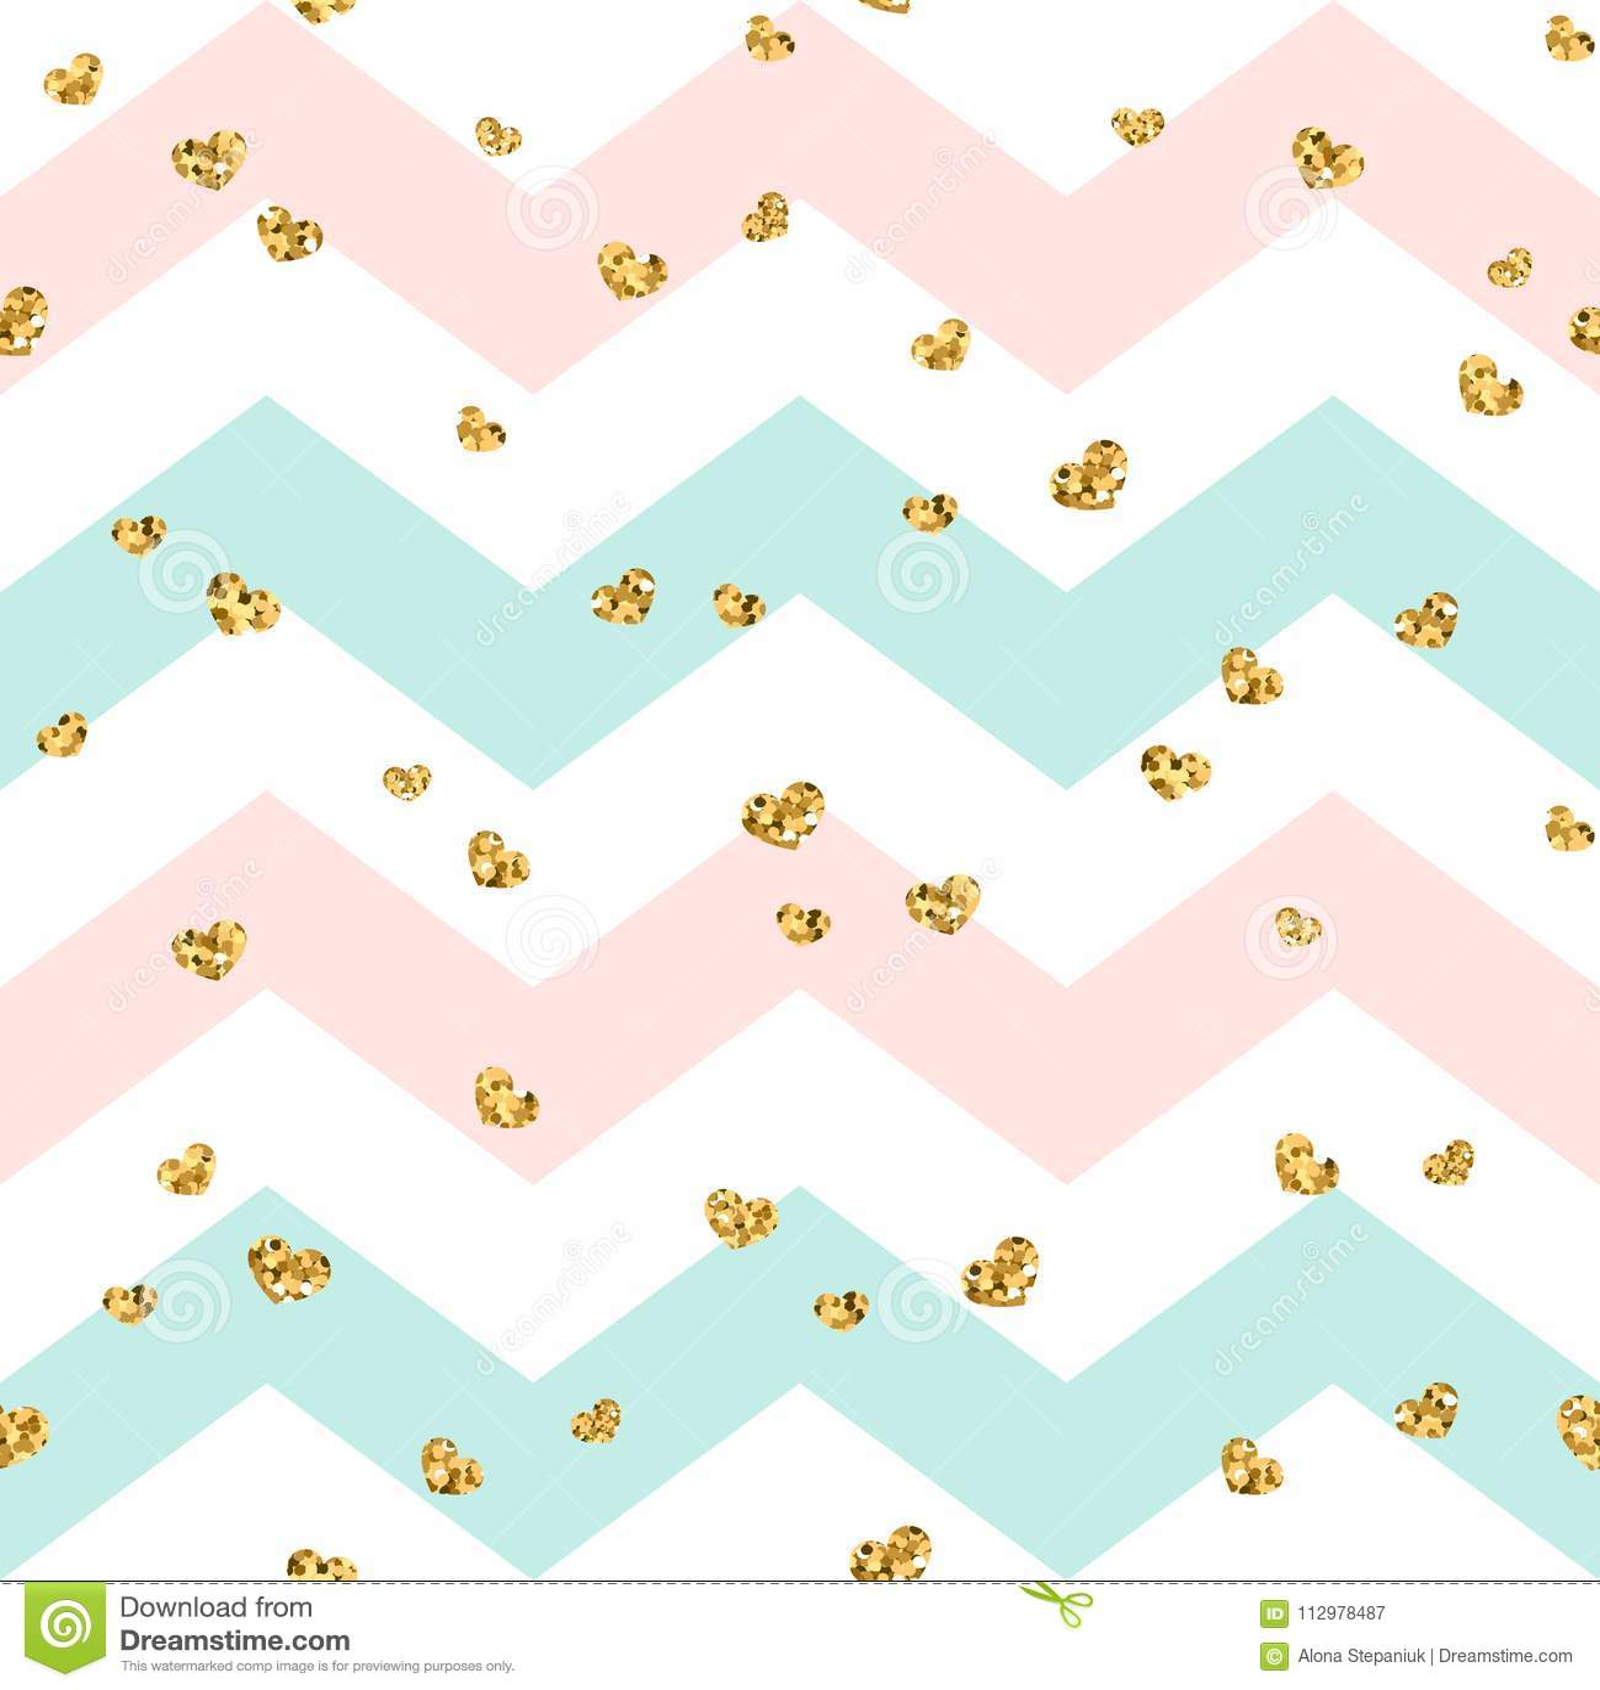 Gold heart seamless pattern. Pink-blue-white geometric zig zag, golden confetti-hearts. Symbol of love, Valentine day